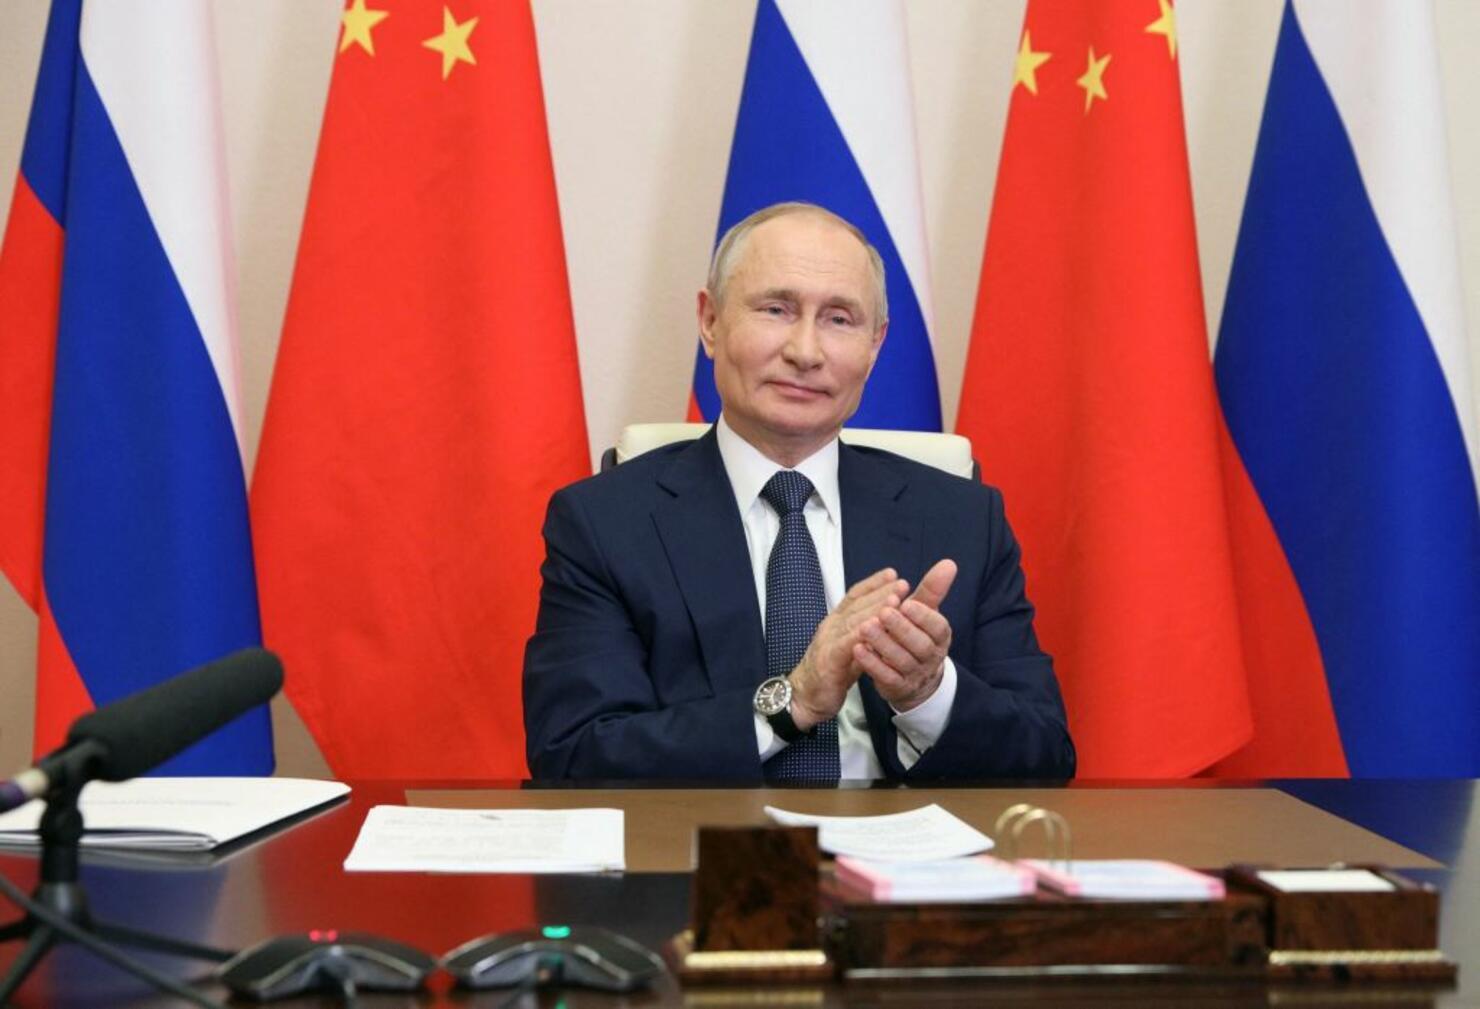 RUSSIA-CHINA-POLITICS-NUCLEAR